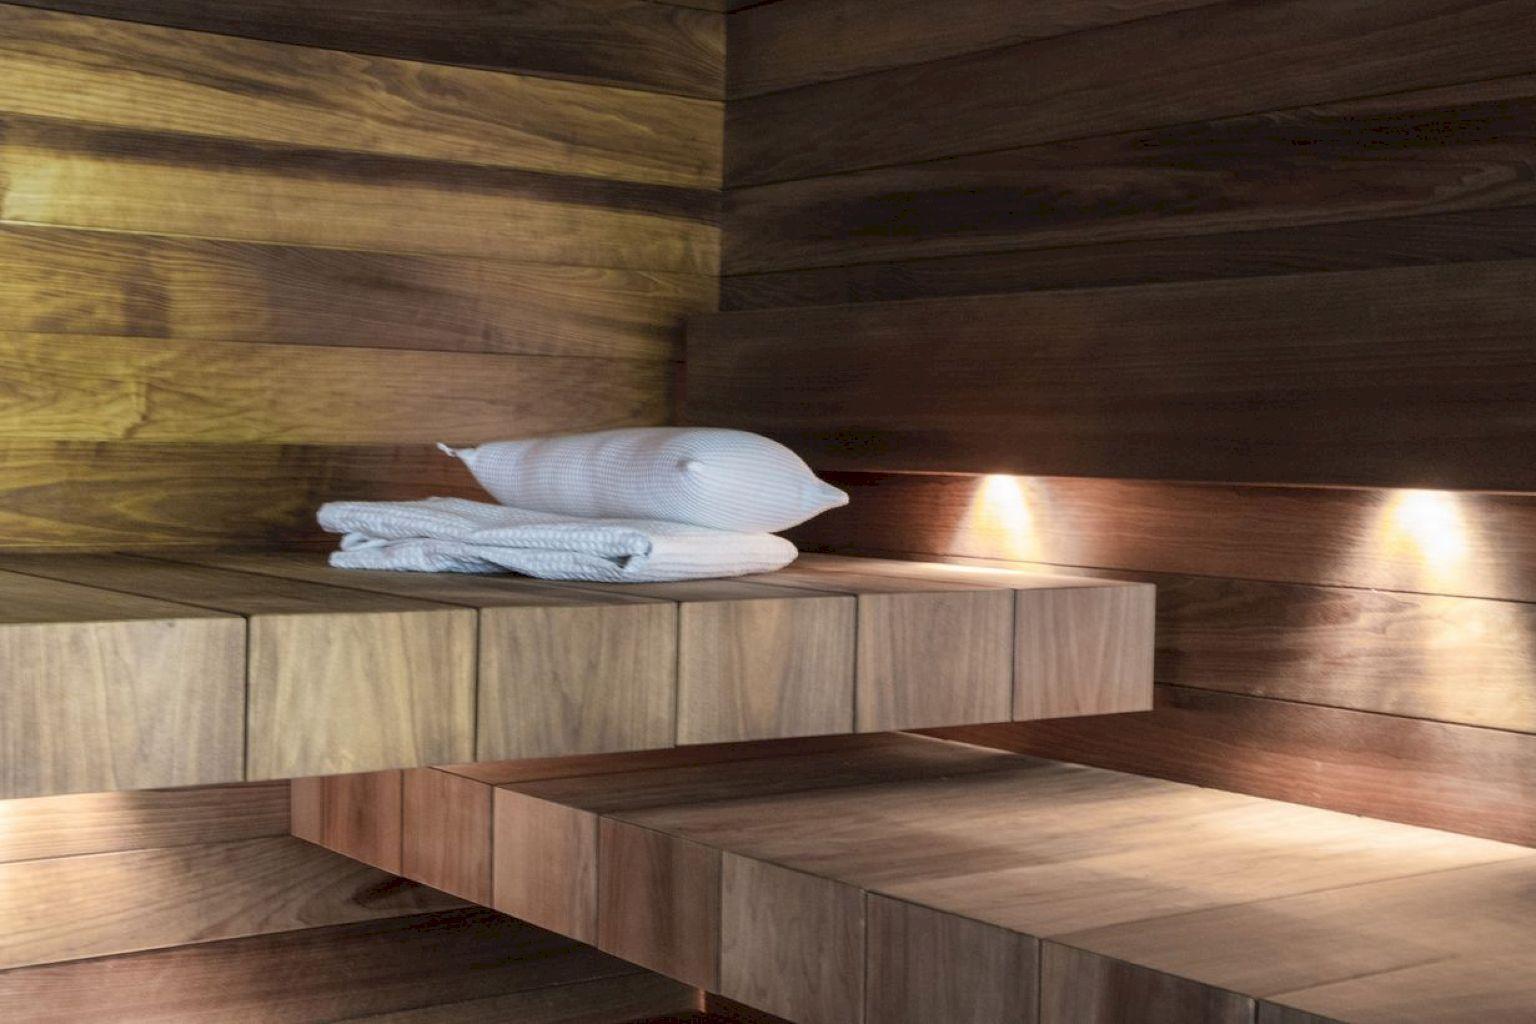 33 Comfy Home Sauna Design Ideas | Sauna design and Saunas